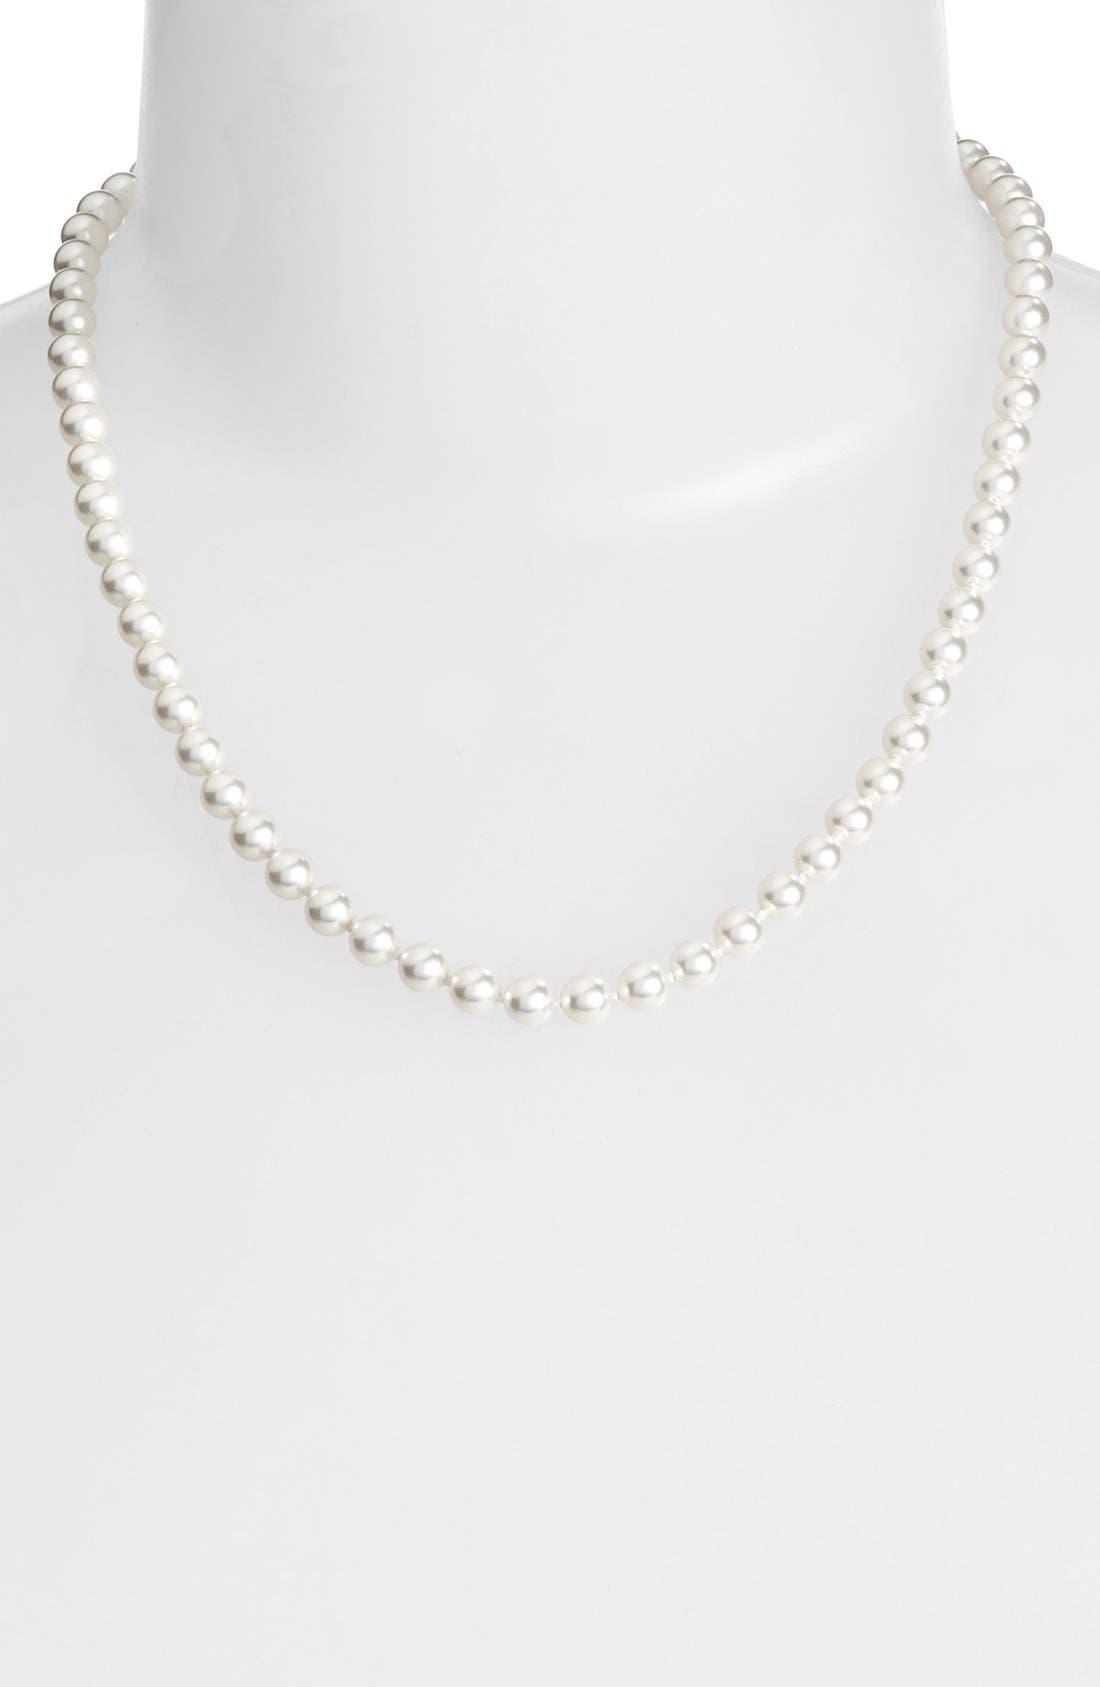 Main Image - NadriImitationPearl Collar Necklace